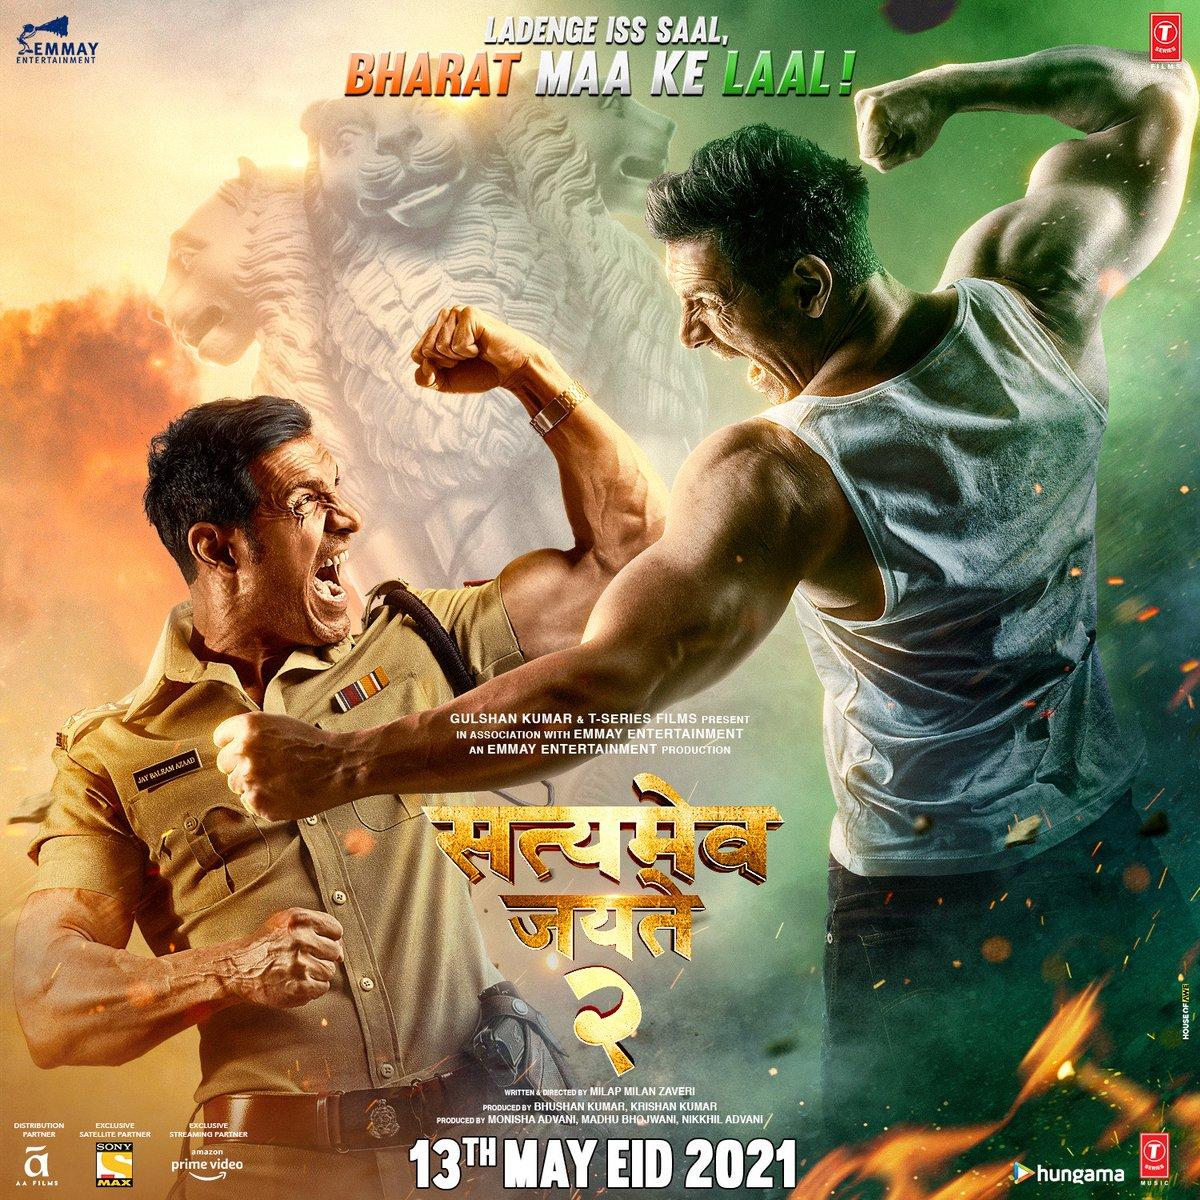 This EID it's JOHN vs JOHN as #SatyamevaJayate2 releases on 13th May 2021! LADENGE iss SAAL, dono BHARAT MAA KE LAAL!  @TheJohnAbraham @iamDivyaKhosla #MilapZaveri @monishaadvani @madhubhojwani @nikkhiladvani #BhushanKumar #KrishanKumar @EmmayEntertain @TSeries @AAFilmsIndia